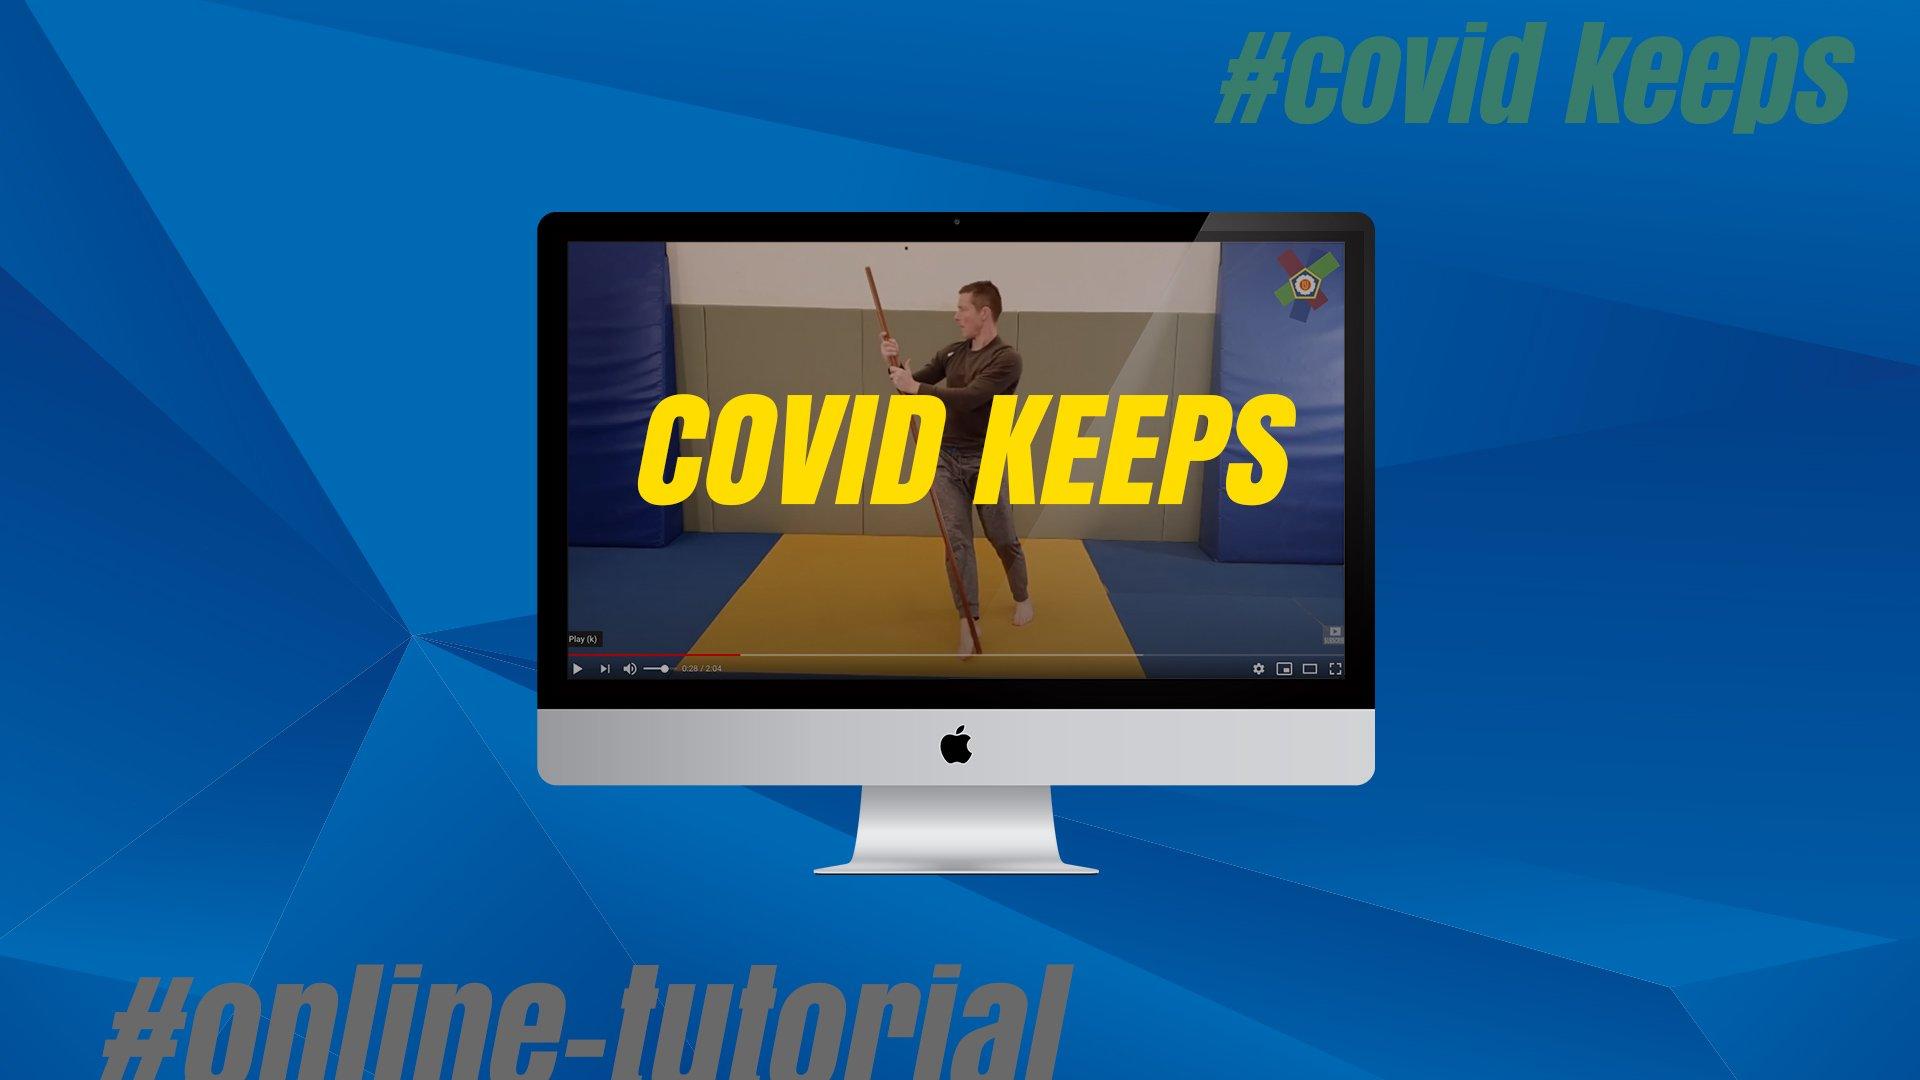 COVID KEEPS